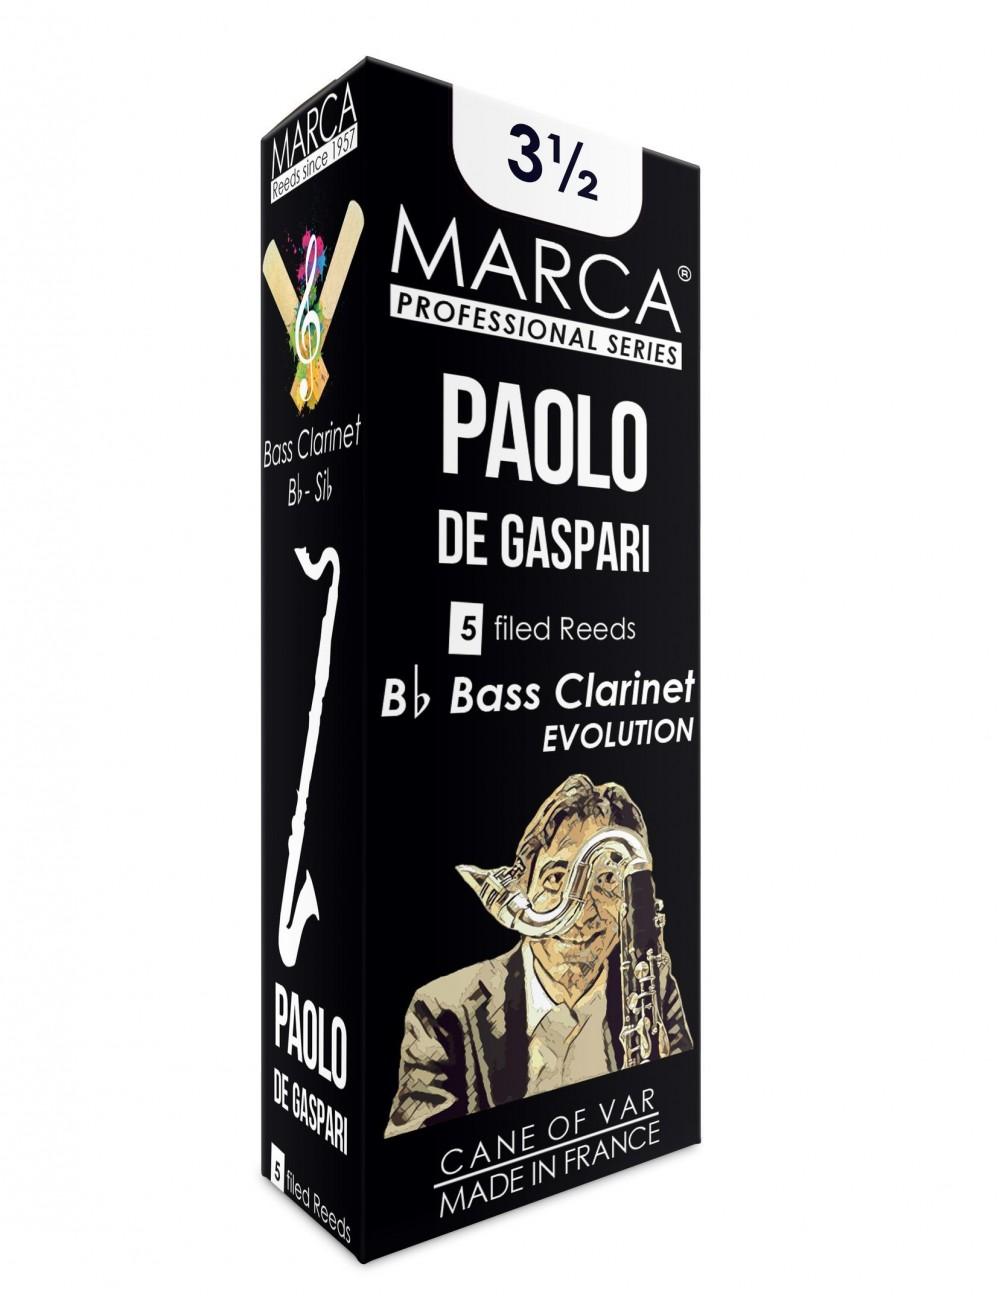 5 REEDS MARCA PAOLO DE GASPARI BASS CLARINET 3.5